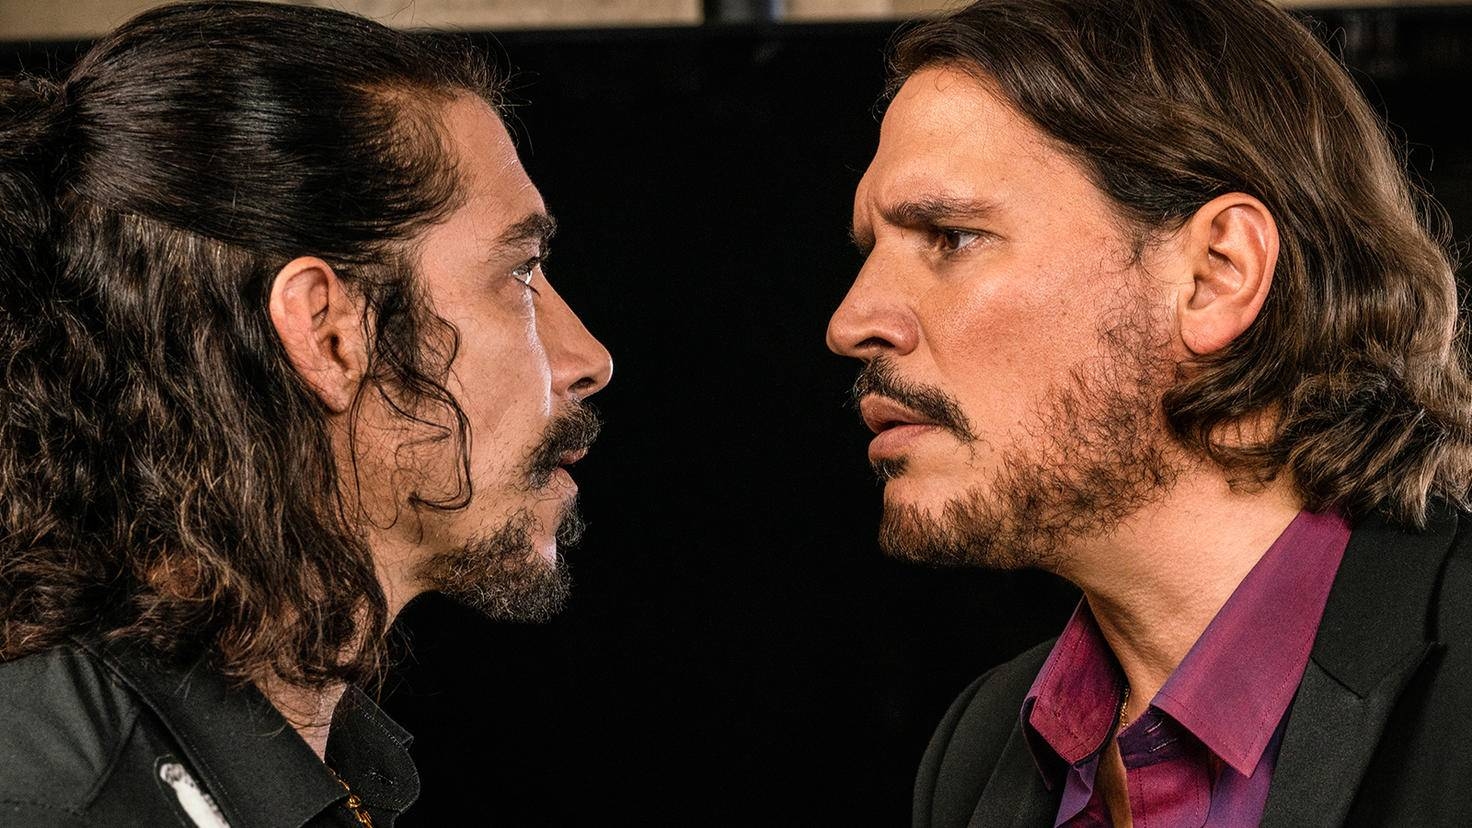 Rambo 5-Oscar Jaenada as Victor Martinez-Sergio Peris Mencheta as Hugo Martinez-Yana Blajeva-Lionsgate